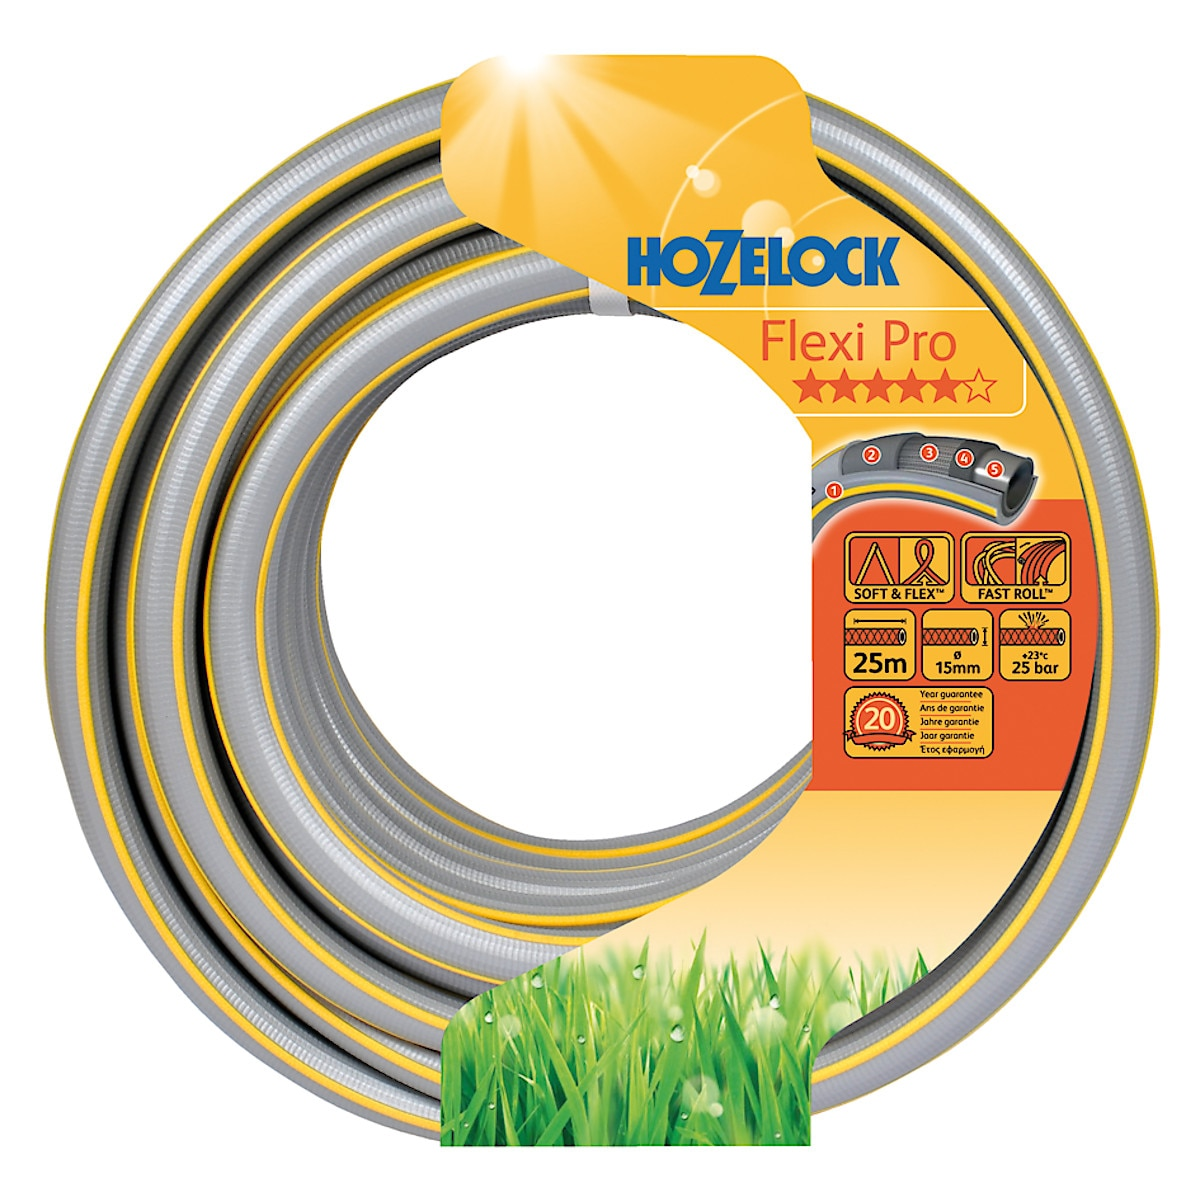 Hozelock Flexi Pro hageslange